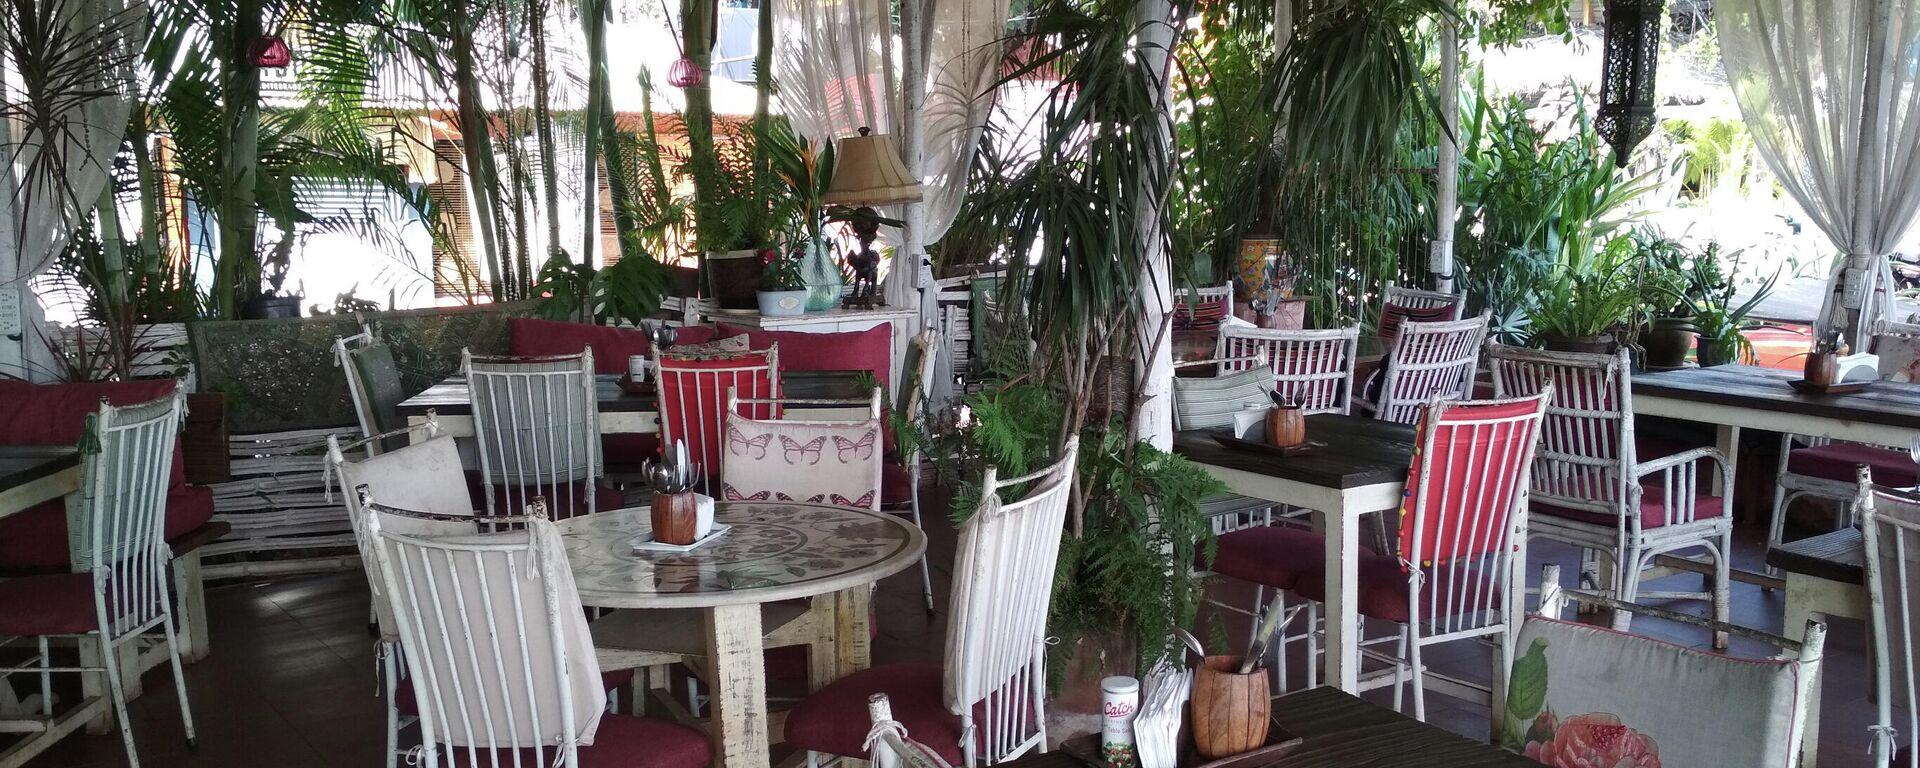 Летняя веранда в кафе - Sputnik Узбекистан, 1920, 18.07.2021